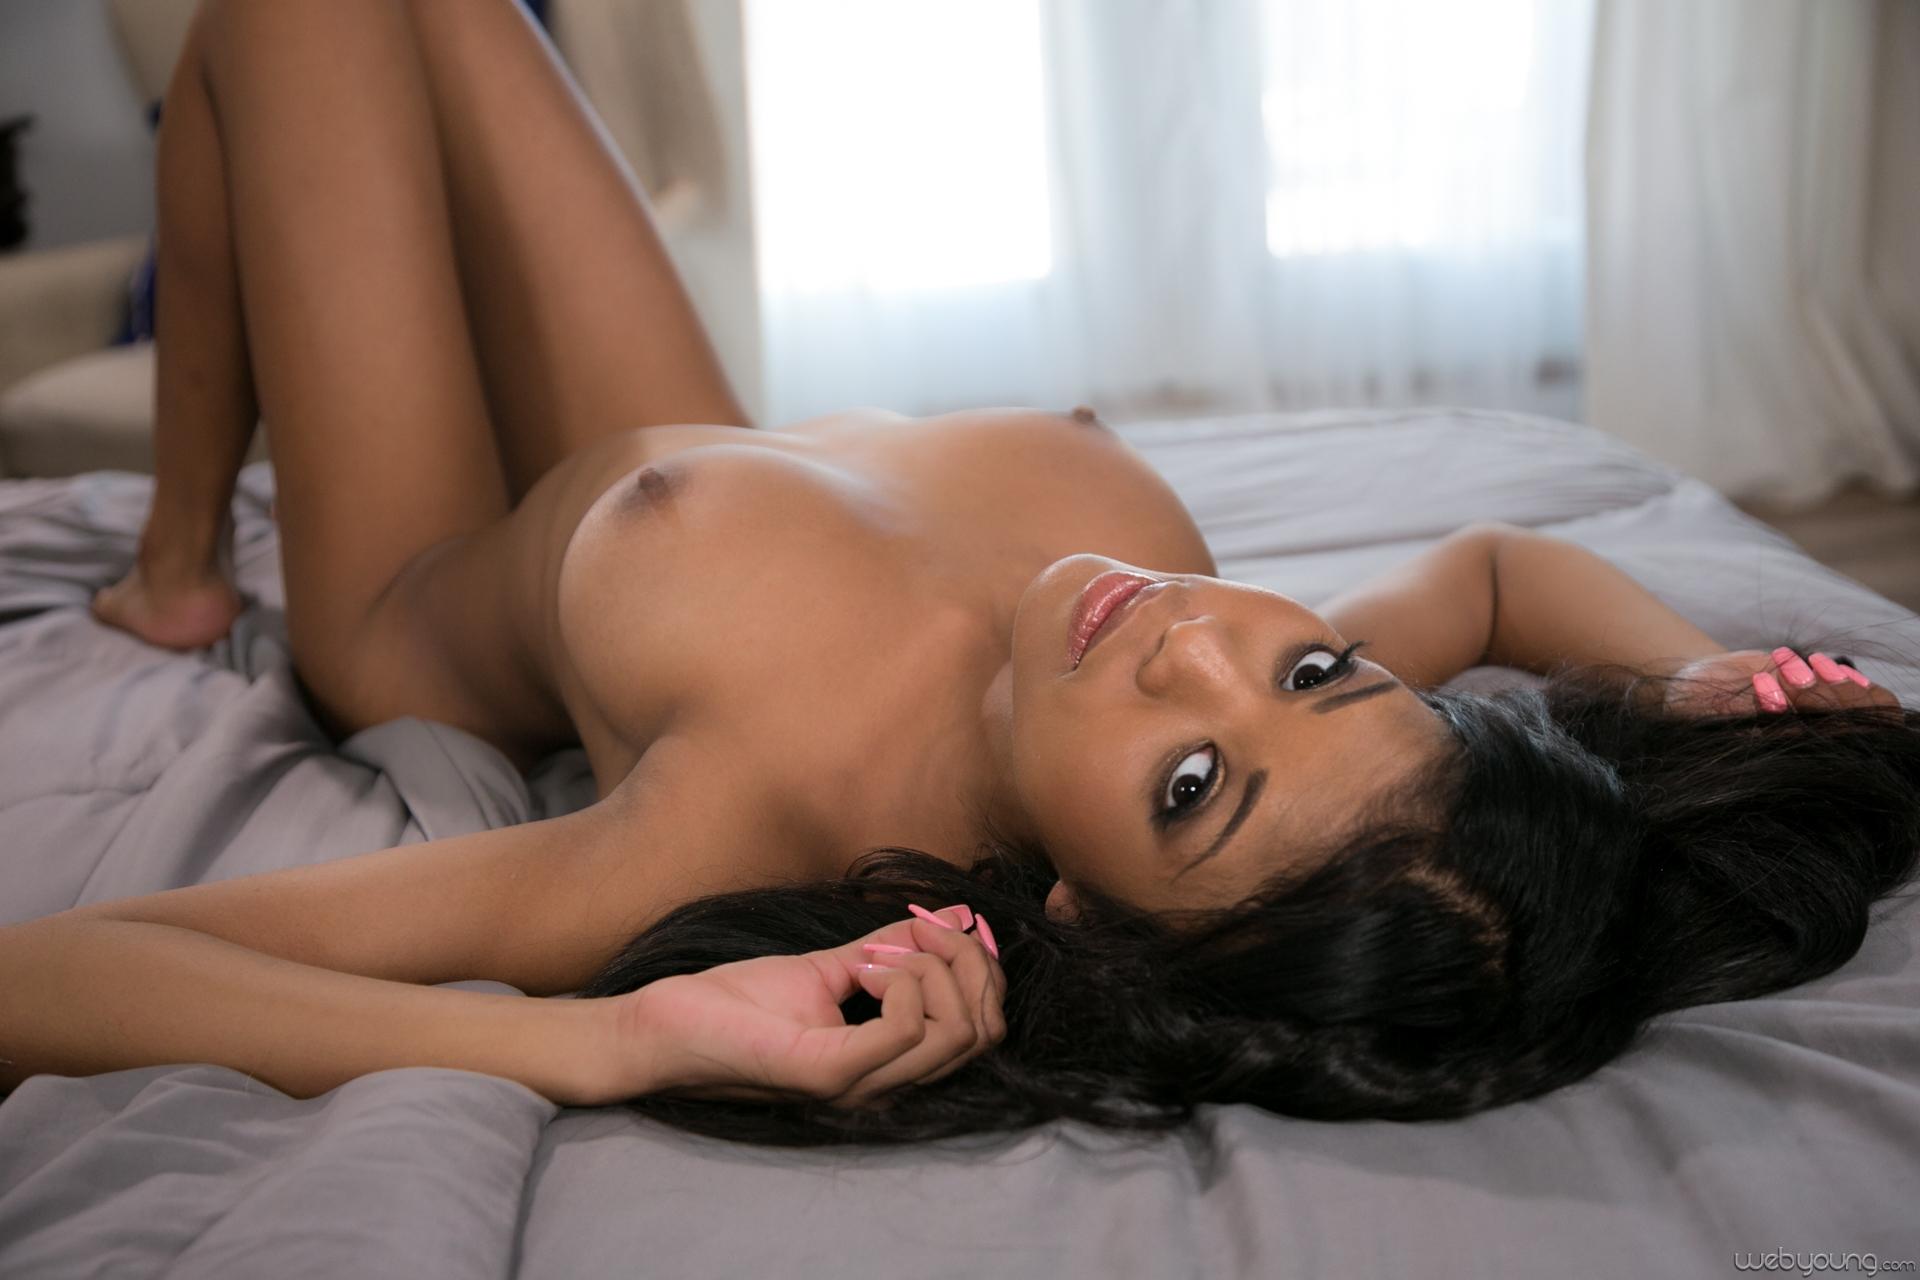 Inexperience ebony girl sucking cock enjoy 4